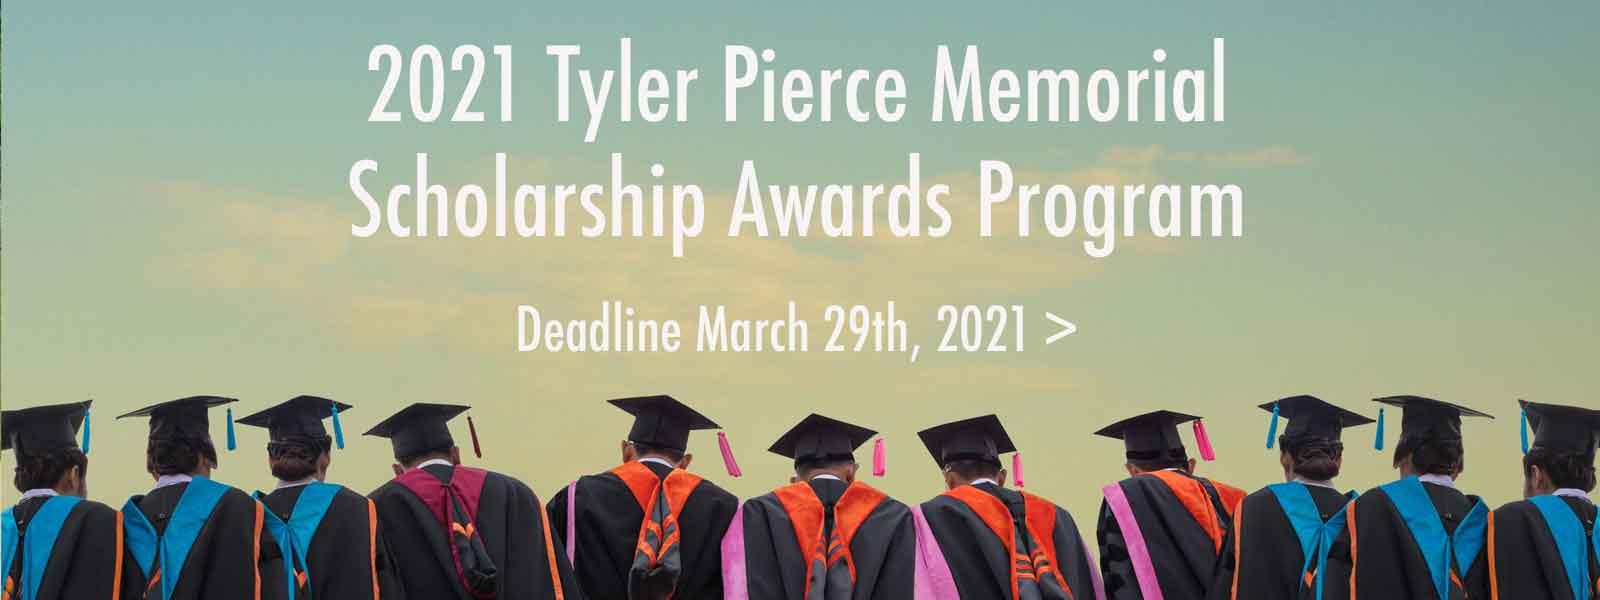 TylersTEAM_2021_Scholarship